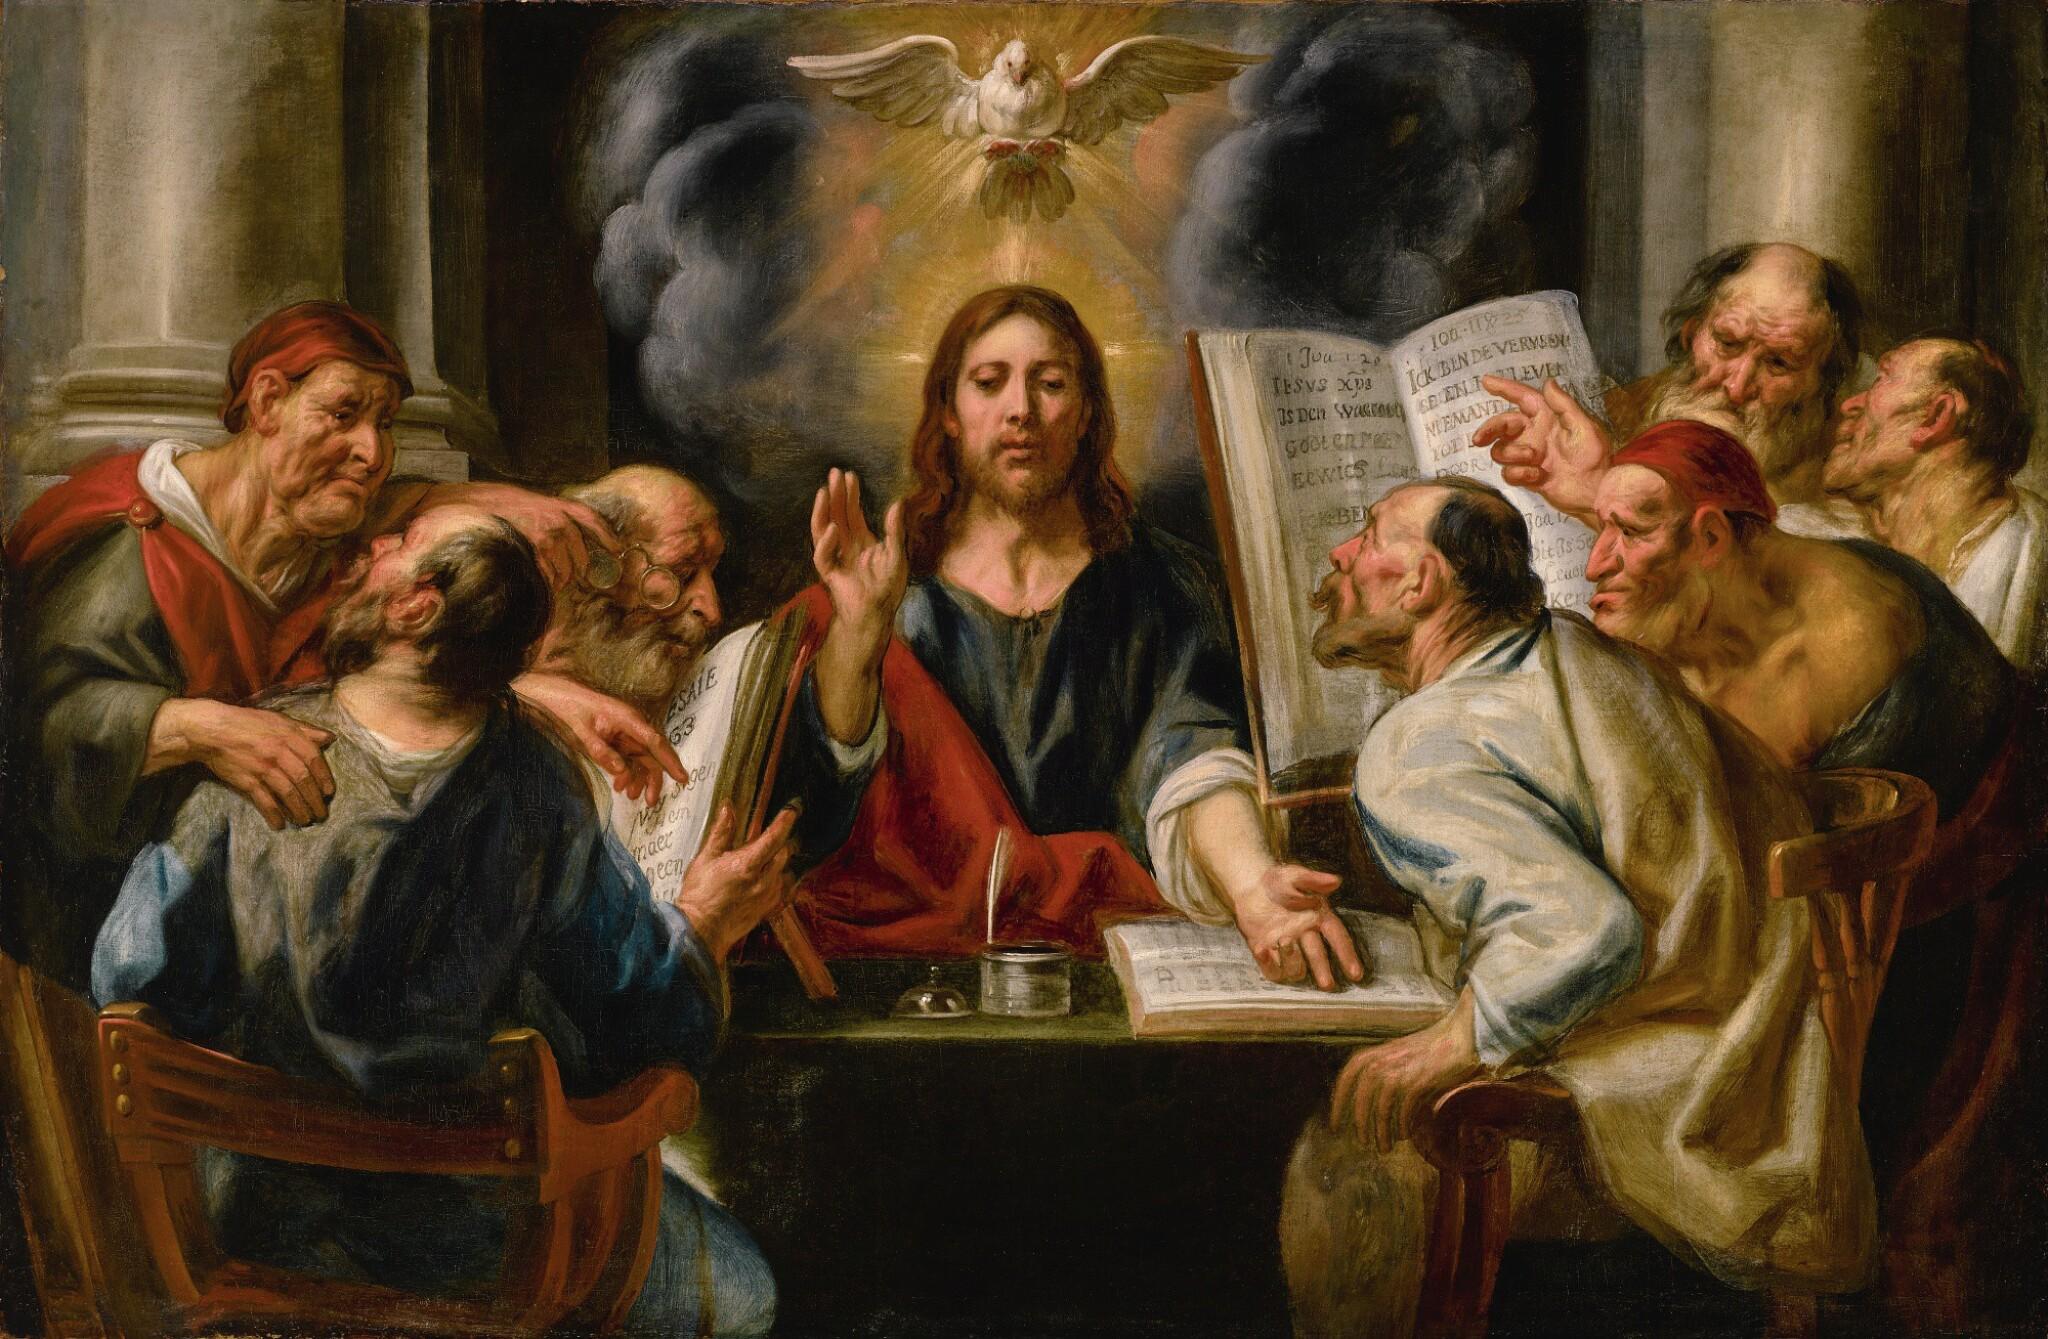 JACOB JORDAENS | Christ among the Pharisees | 雅格・約達恩 | 《在法利賽人之間的基督》